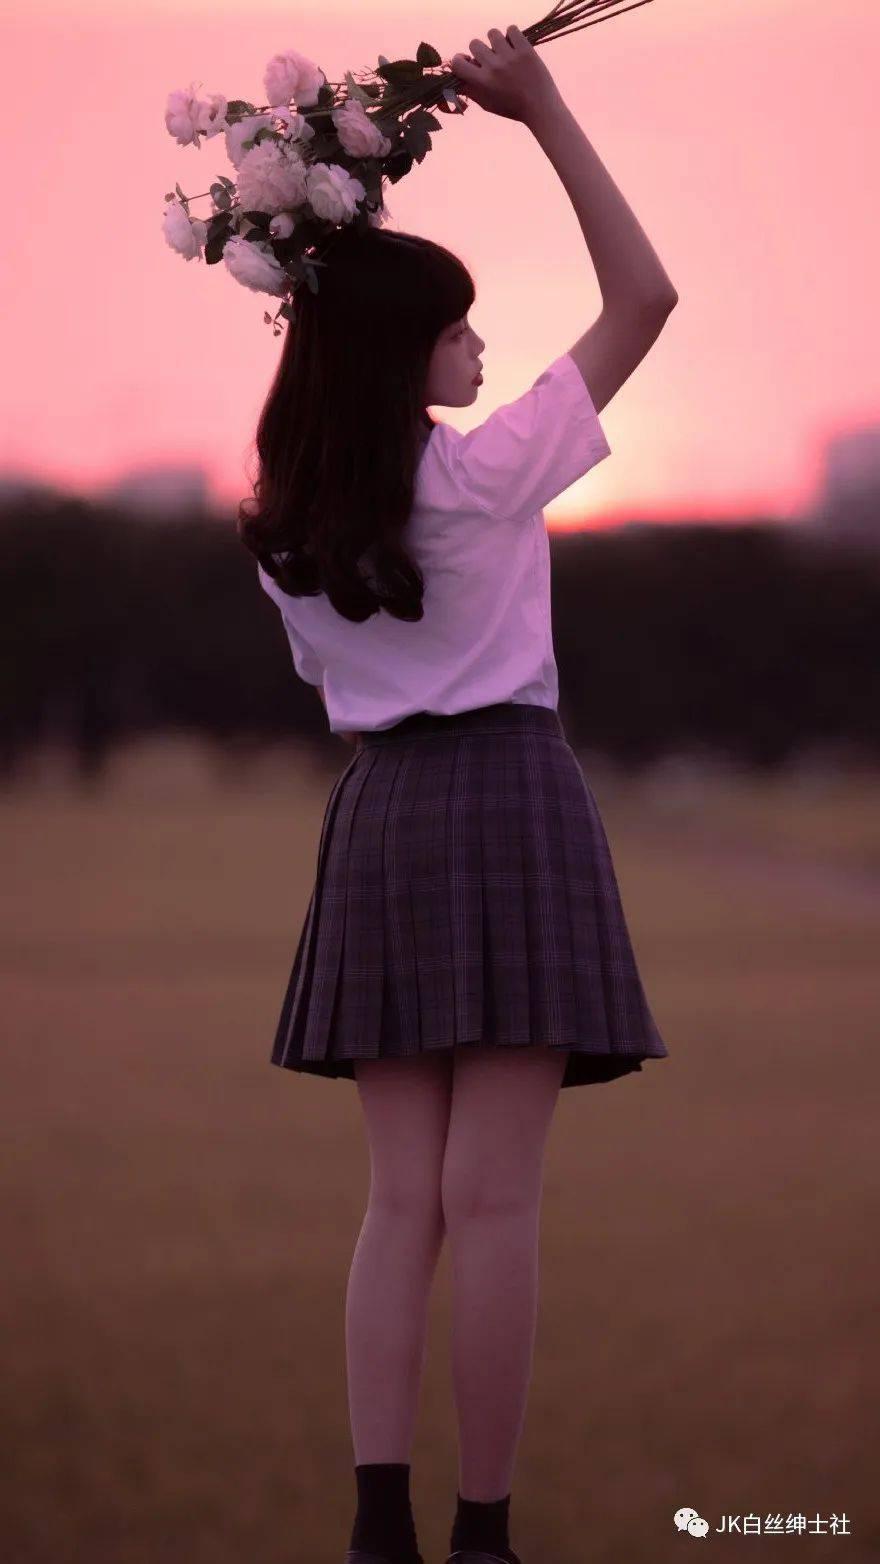 JK少女:我们在夏天相遇,又走向各自的夏天